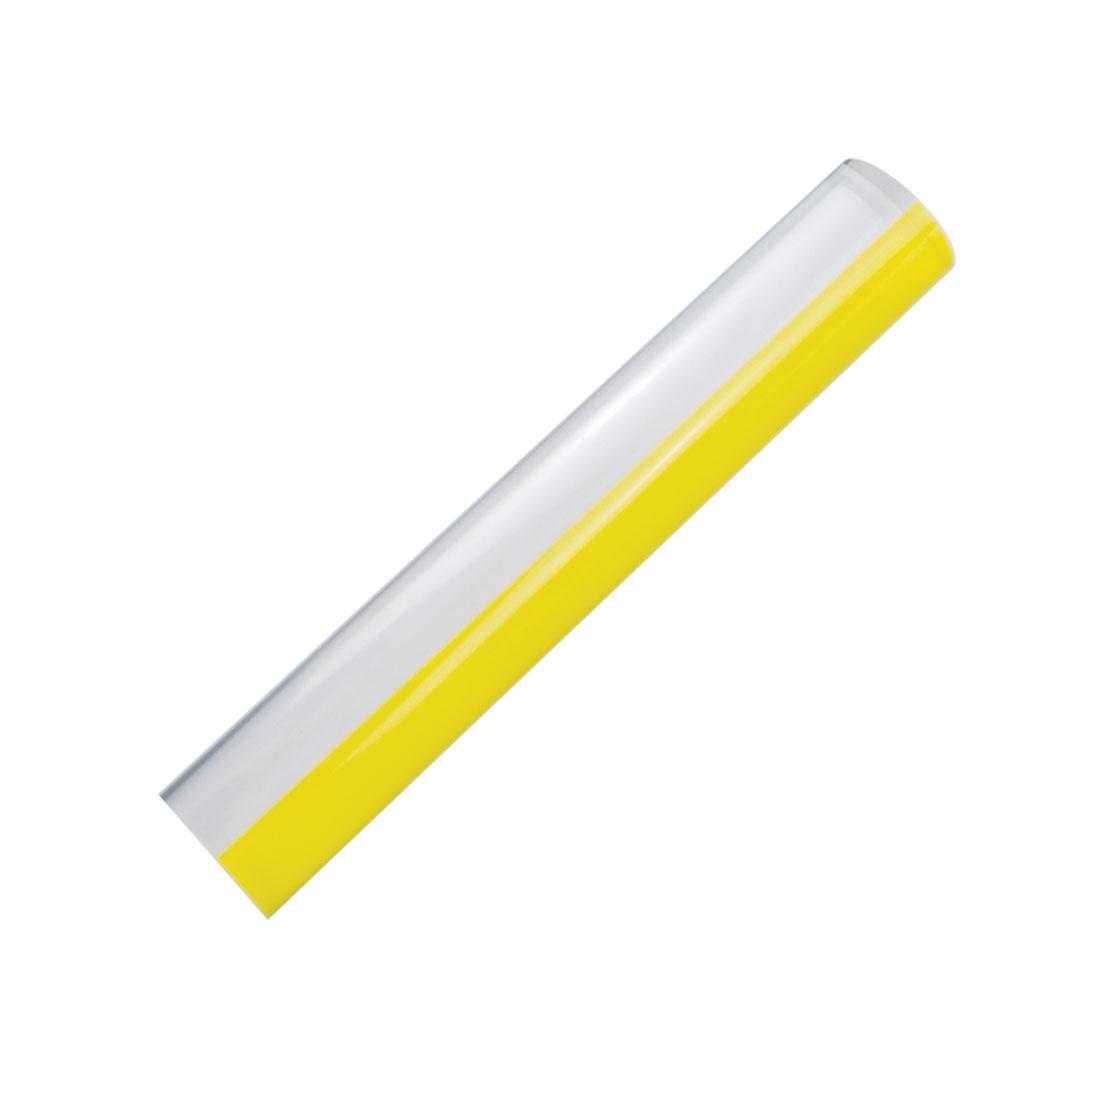 EZ Magnibar - Half-Yellow - 6 inches